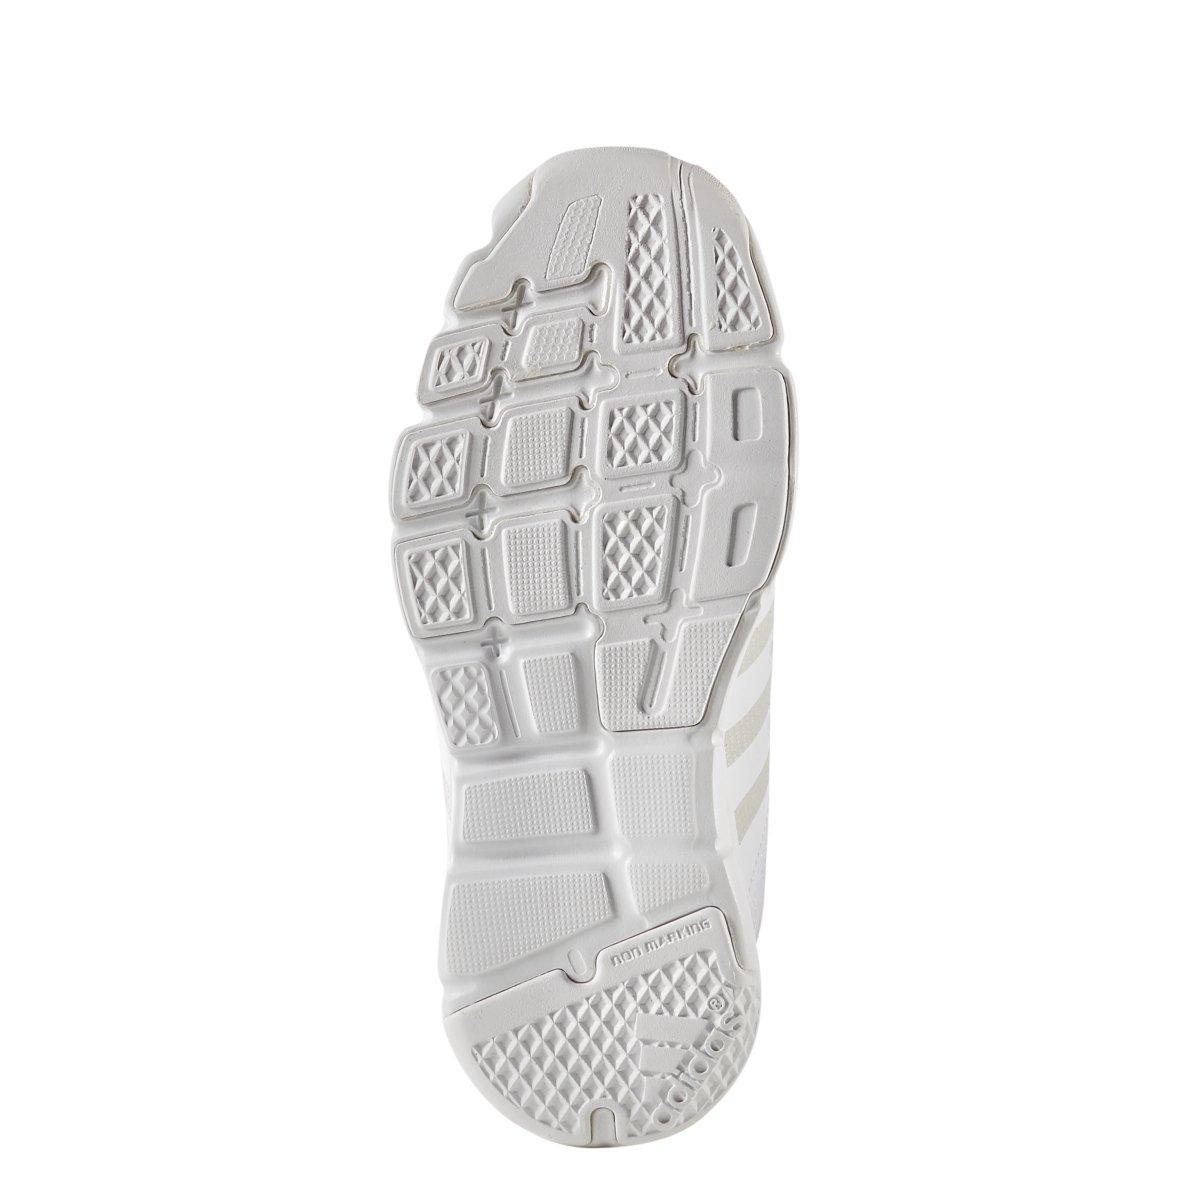 c439f9562b1ded adidas Triple Cheer Shoe Kids Training Holiday Gifts